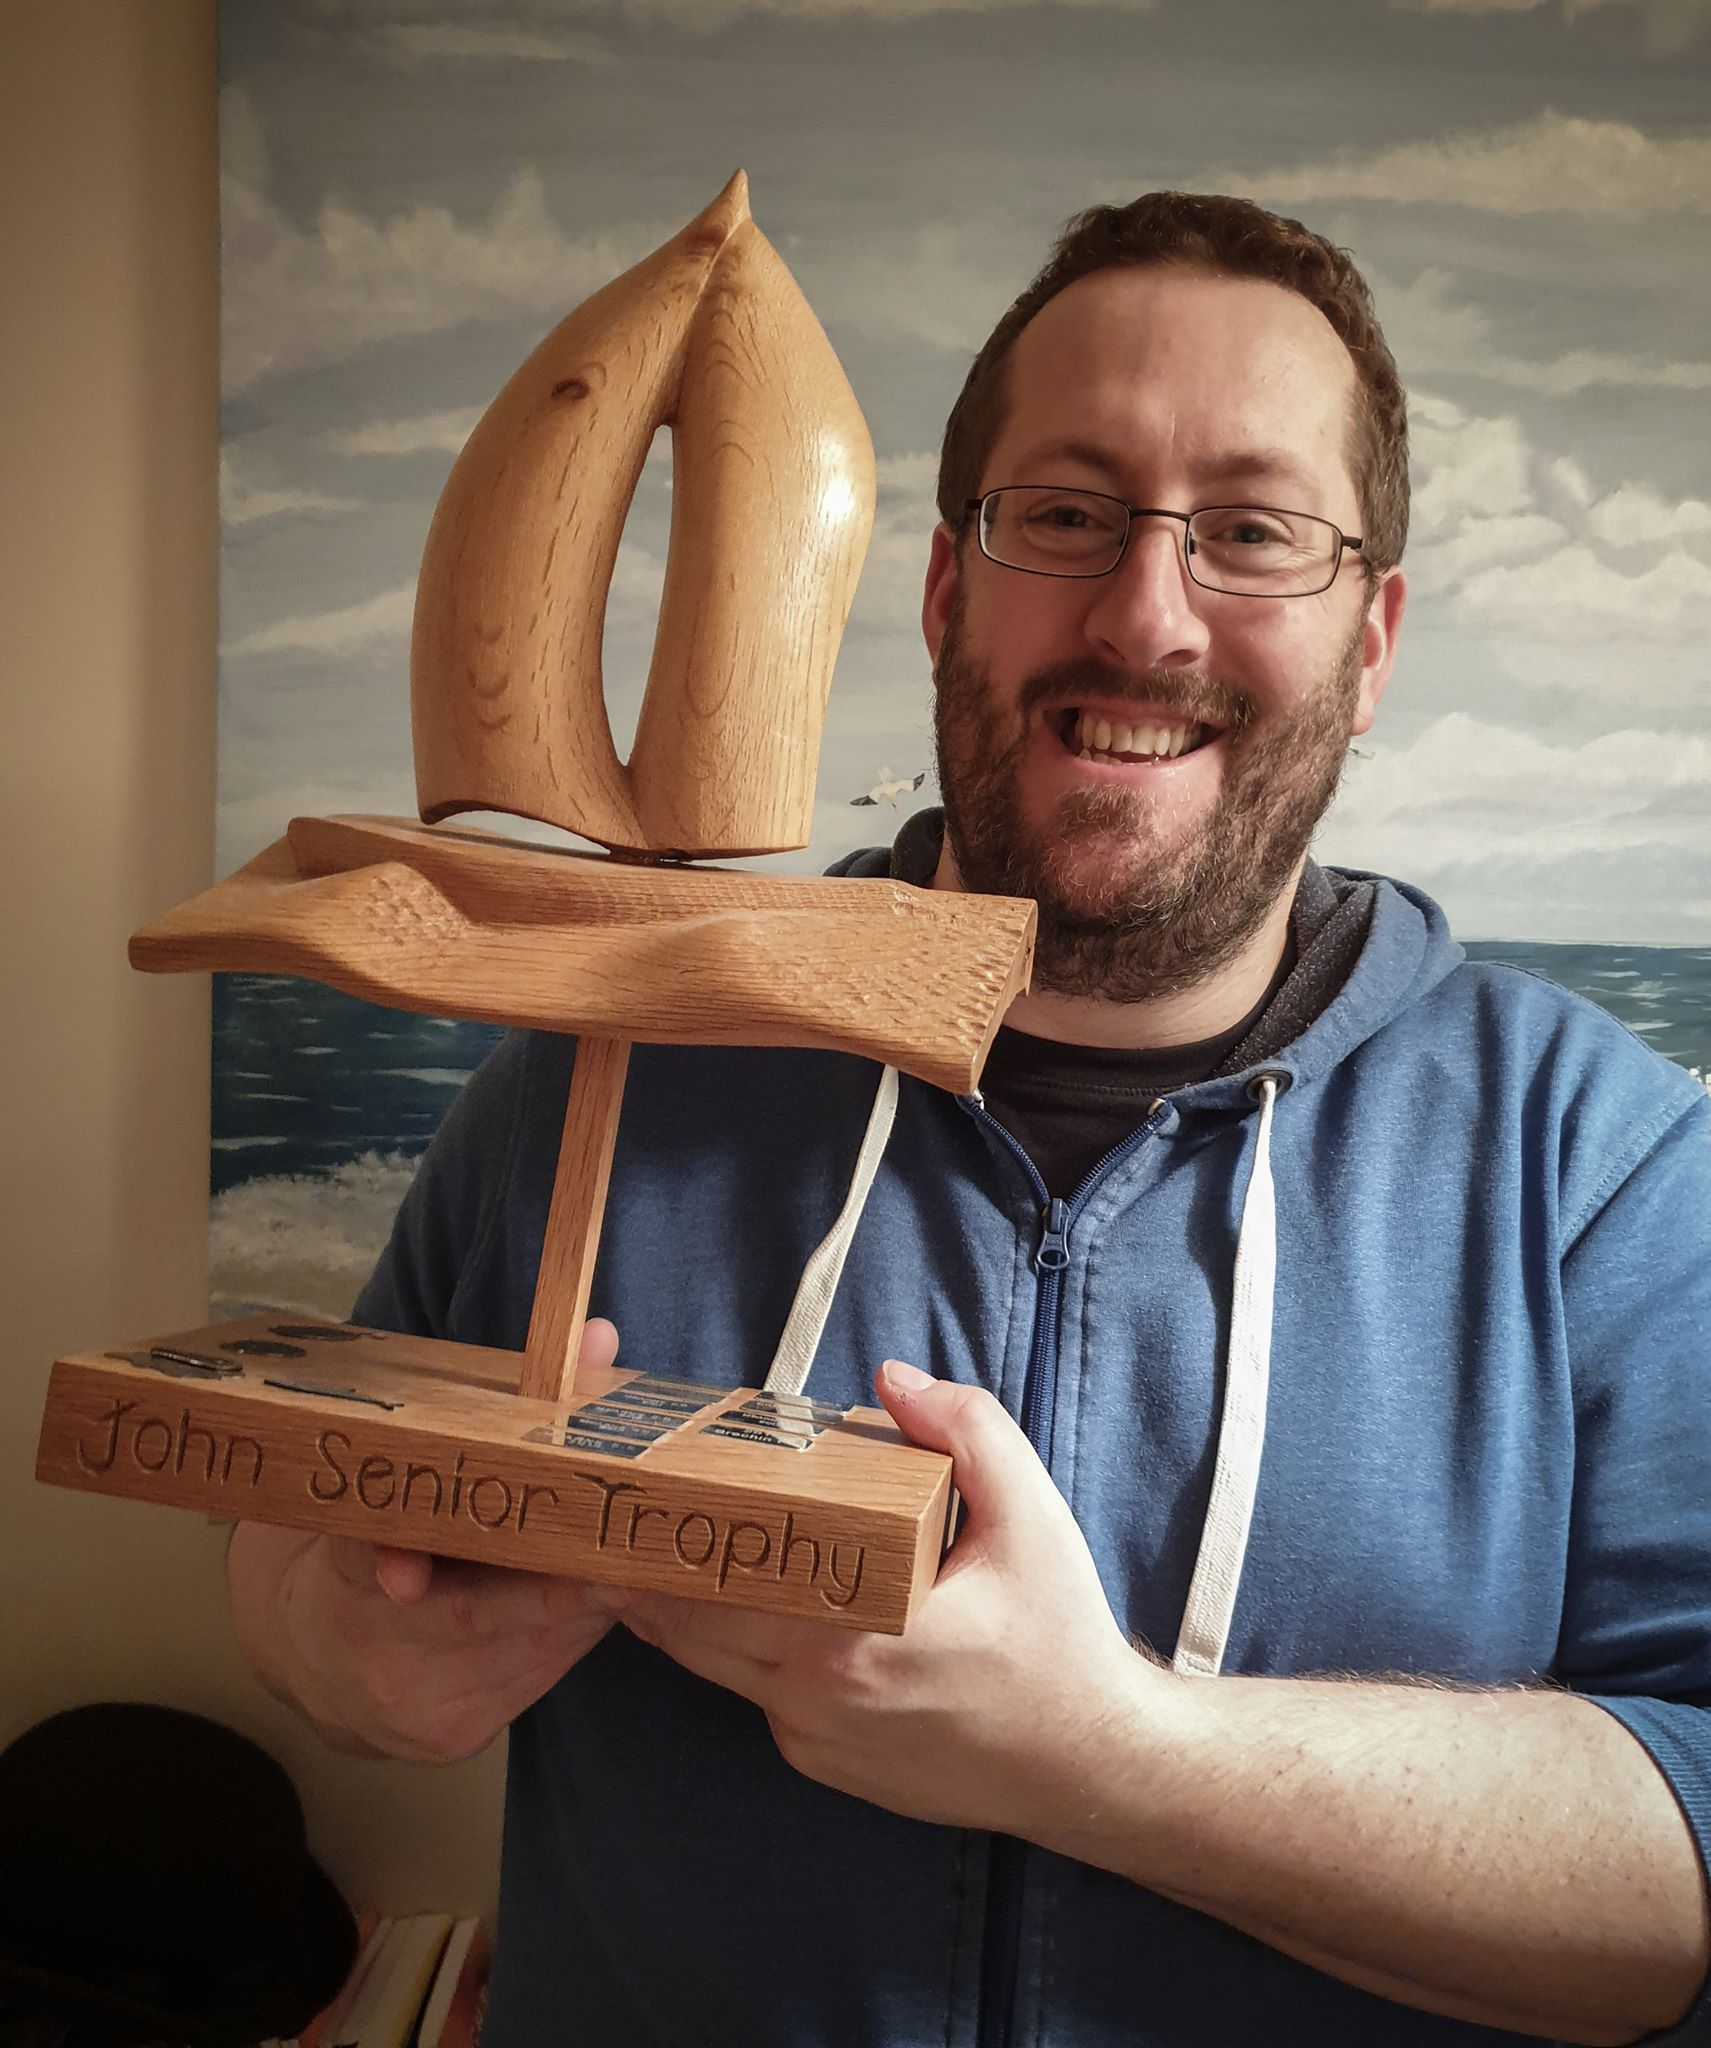 Ben with John Senior Trophy